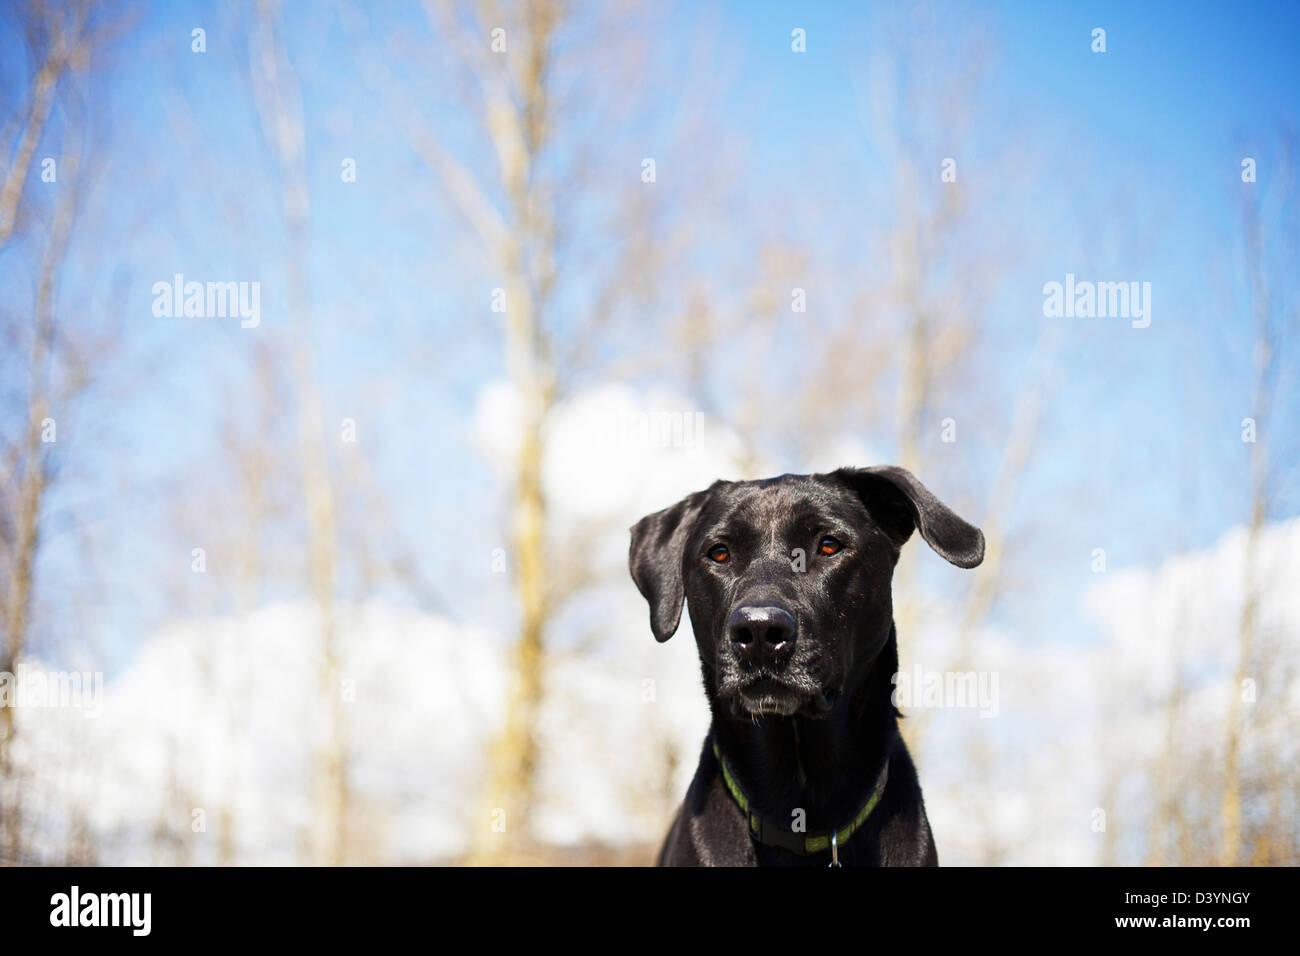 Mixed Breed Labrador Retriever, British Columbia, Canada Stock Photo